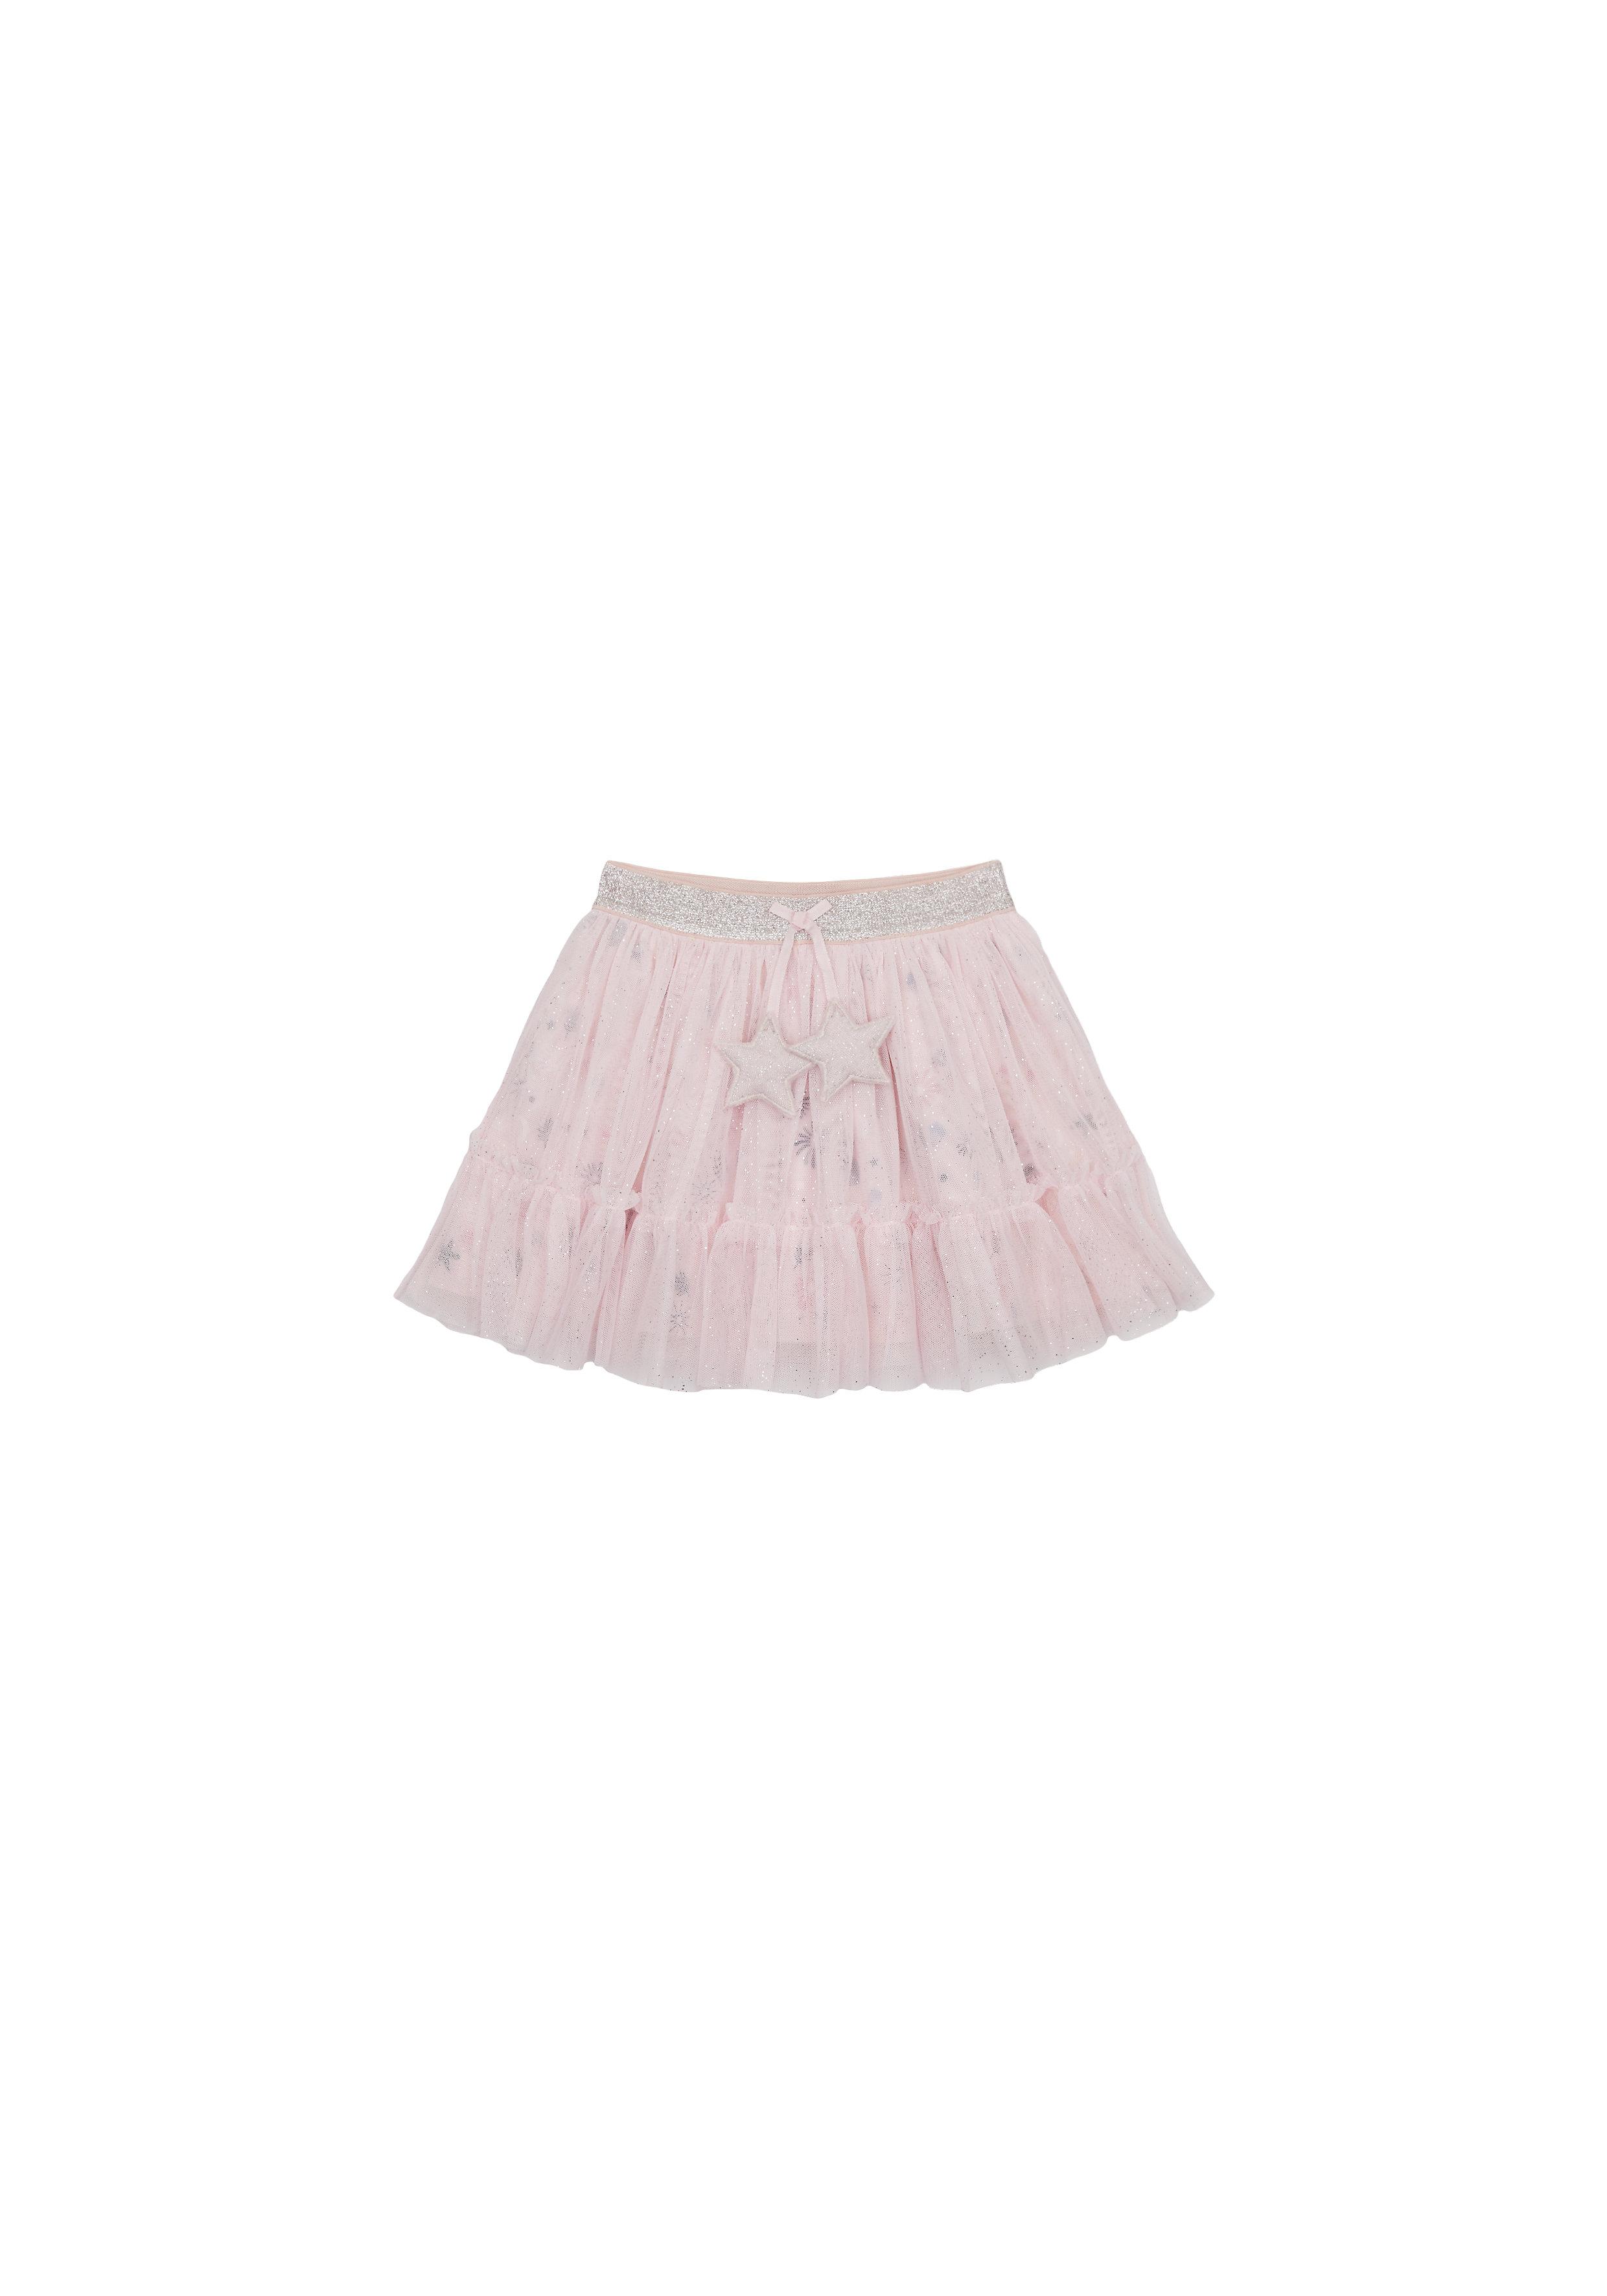 Mothercare   Girls Mesh Skirt Star Detail - Pink